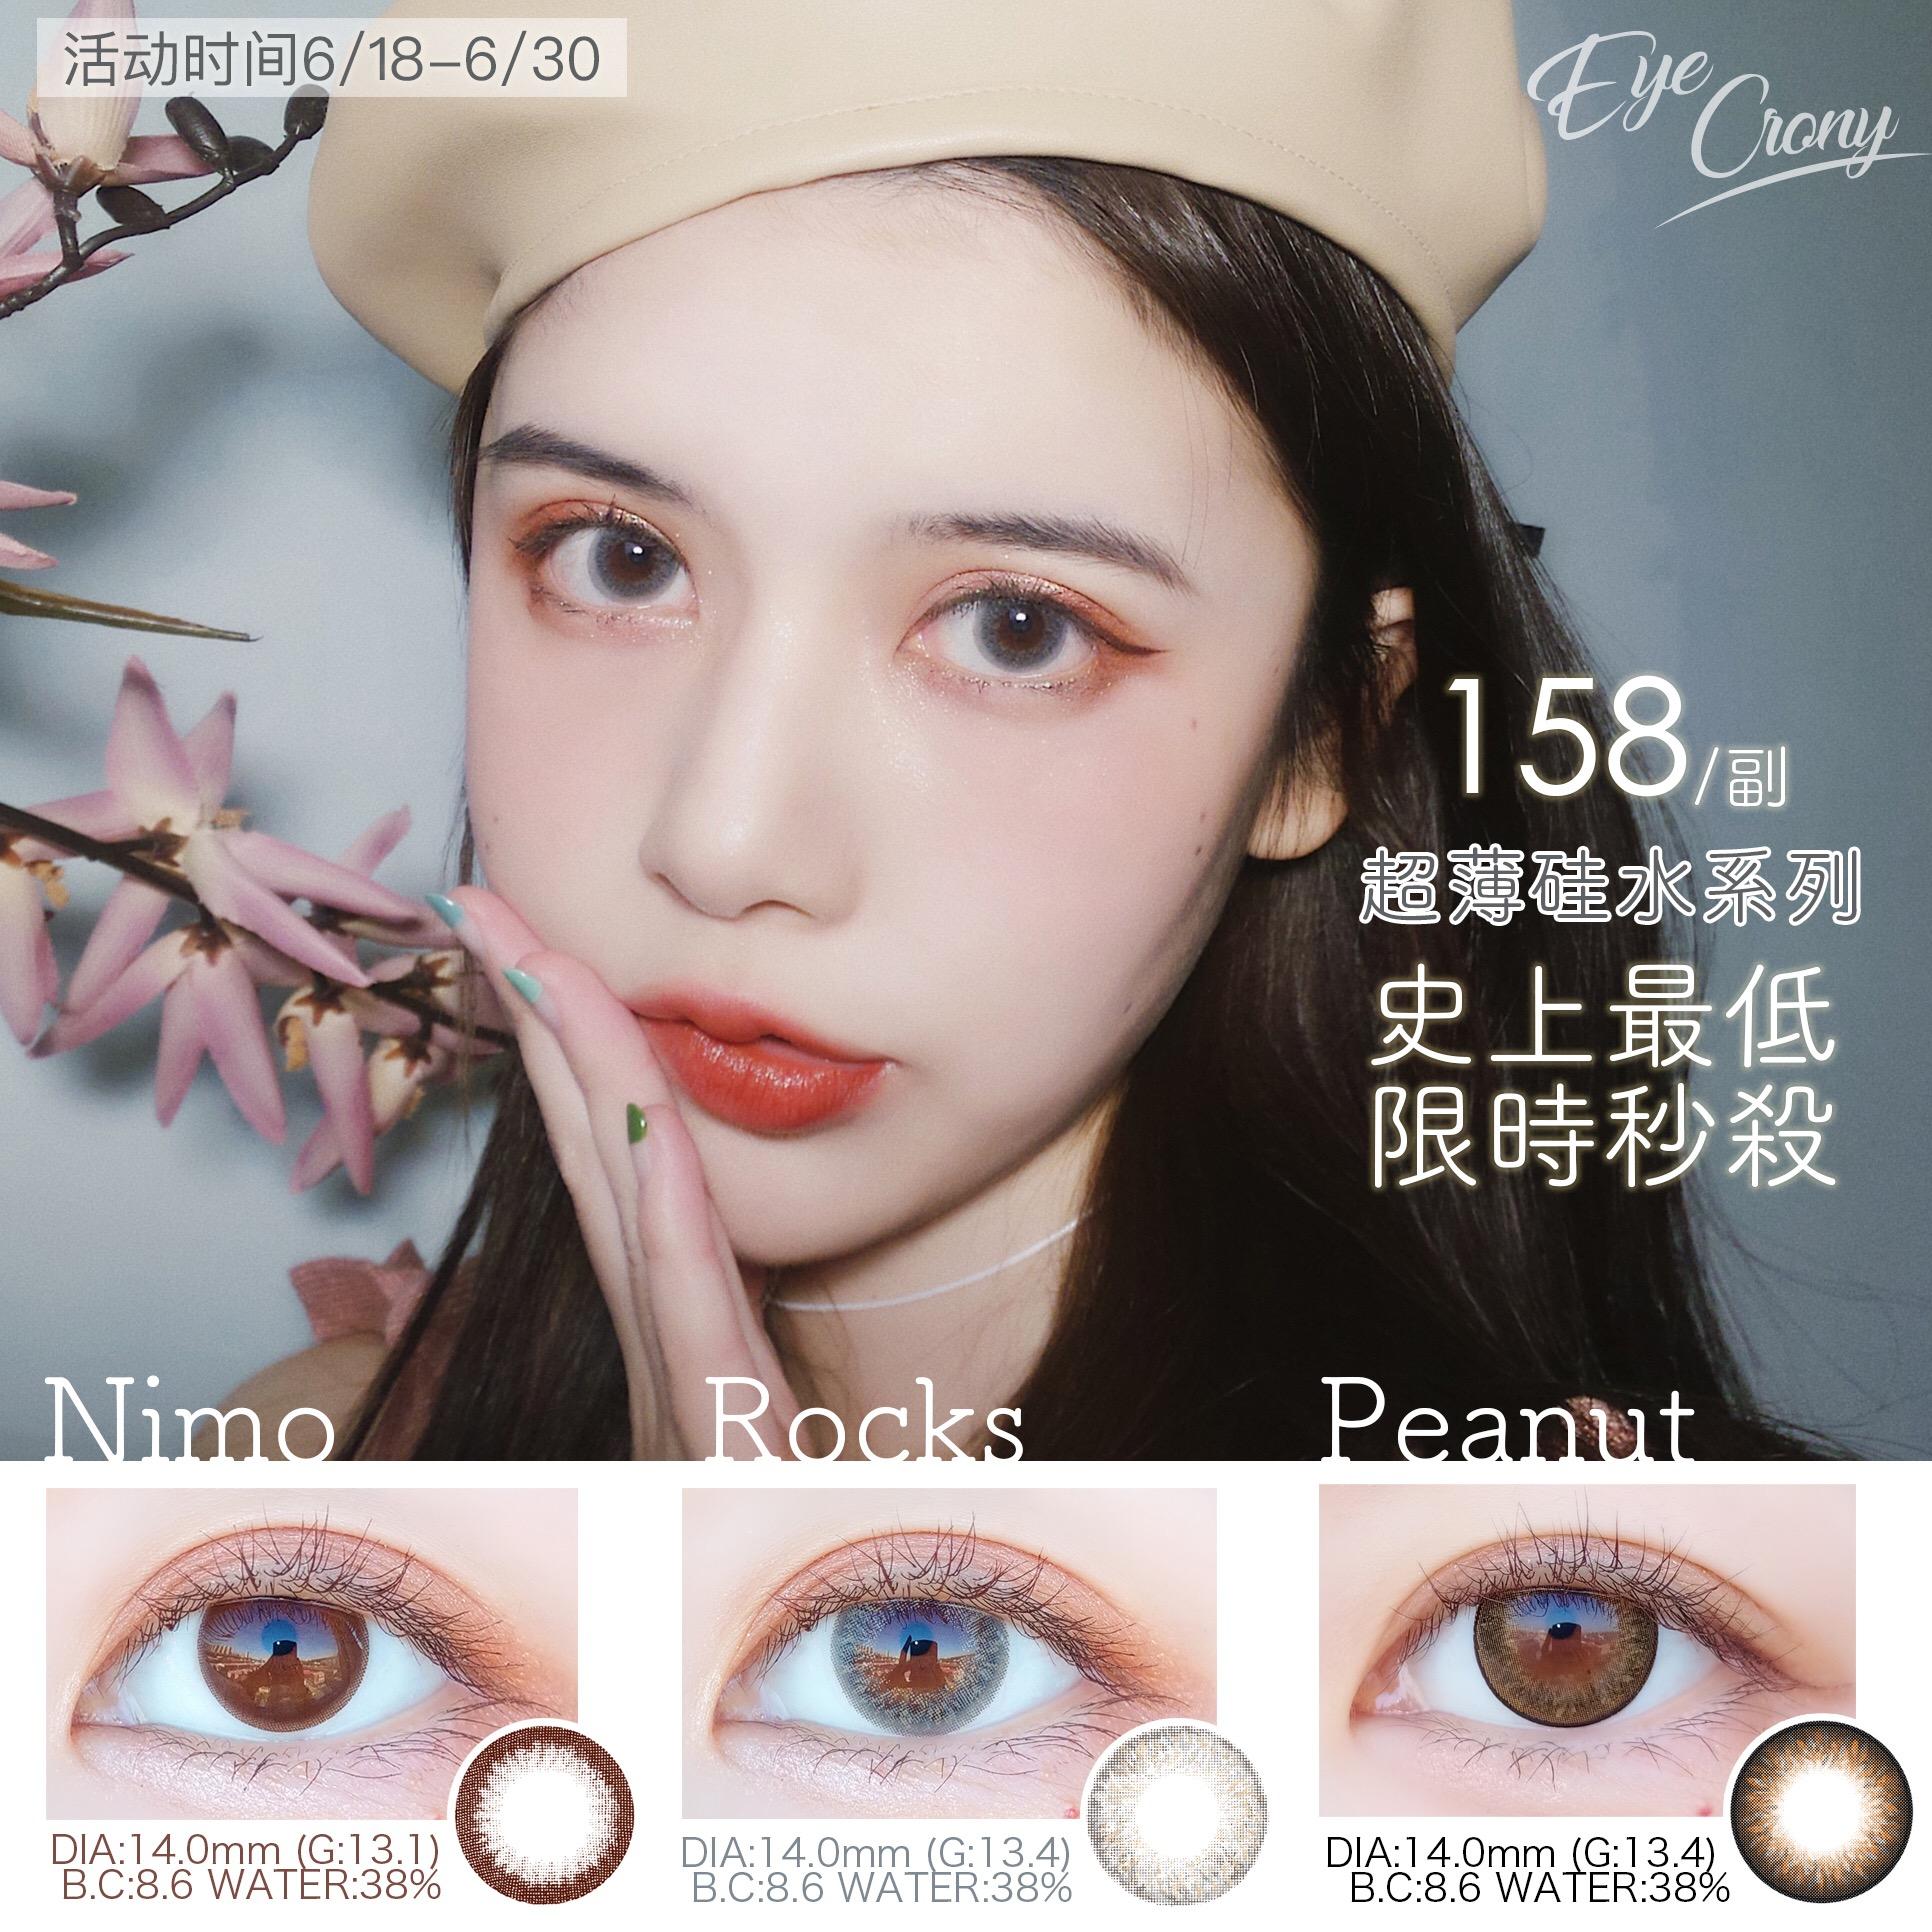 EyeCrony美瞳 超薄硅水凝胶